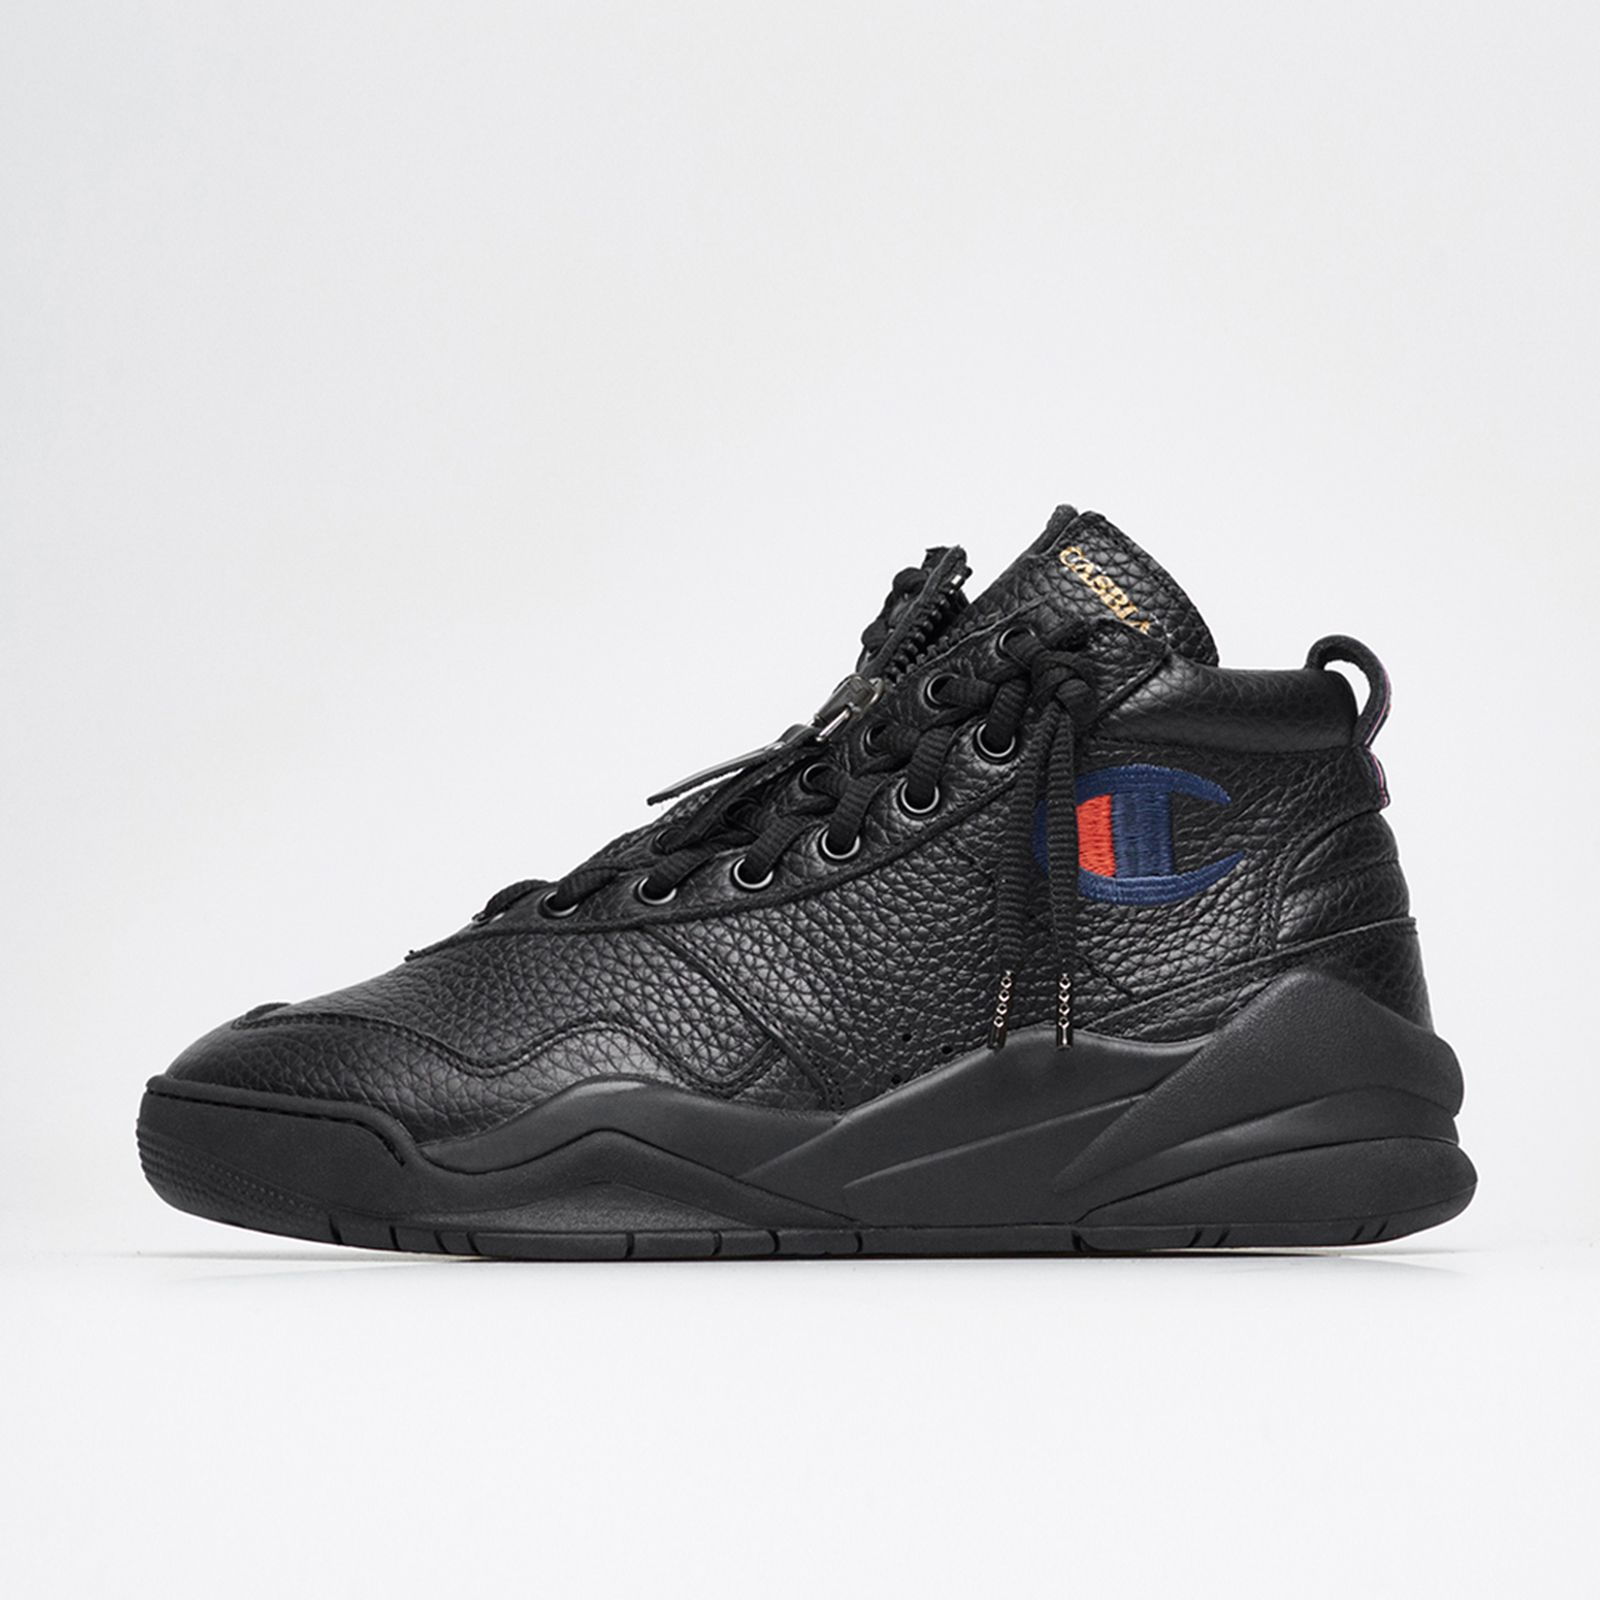 casbia champion atlanta sneakers